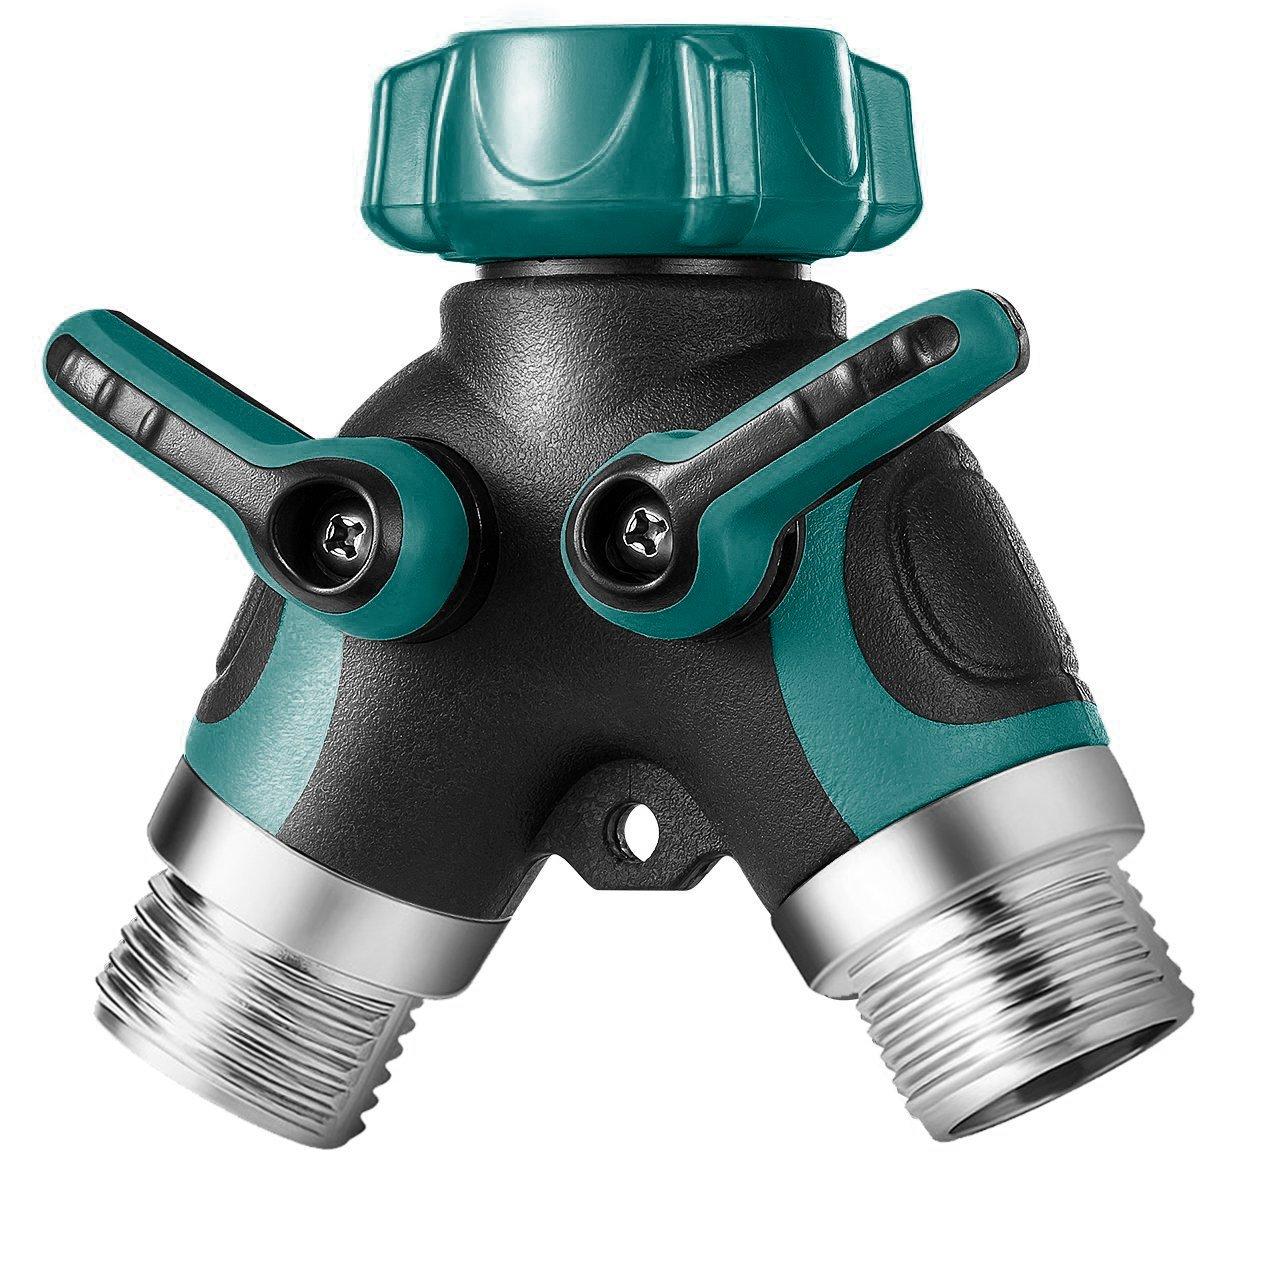 Elekin Y Hose Connector Garden Hose Splitter, 2 Ways Faucet Y Connetor 3/4'' Zinc Alloy Body, Fit with Outdoor Faucet, Comfortable Rubberized Grip (Invisible Green)